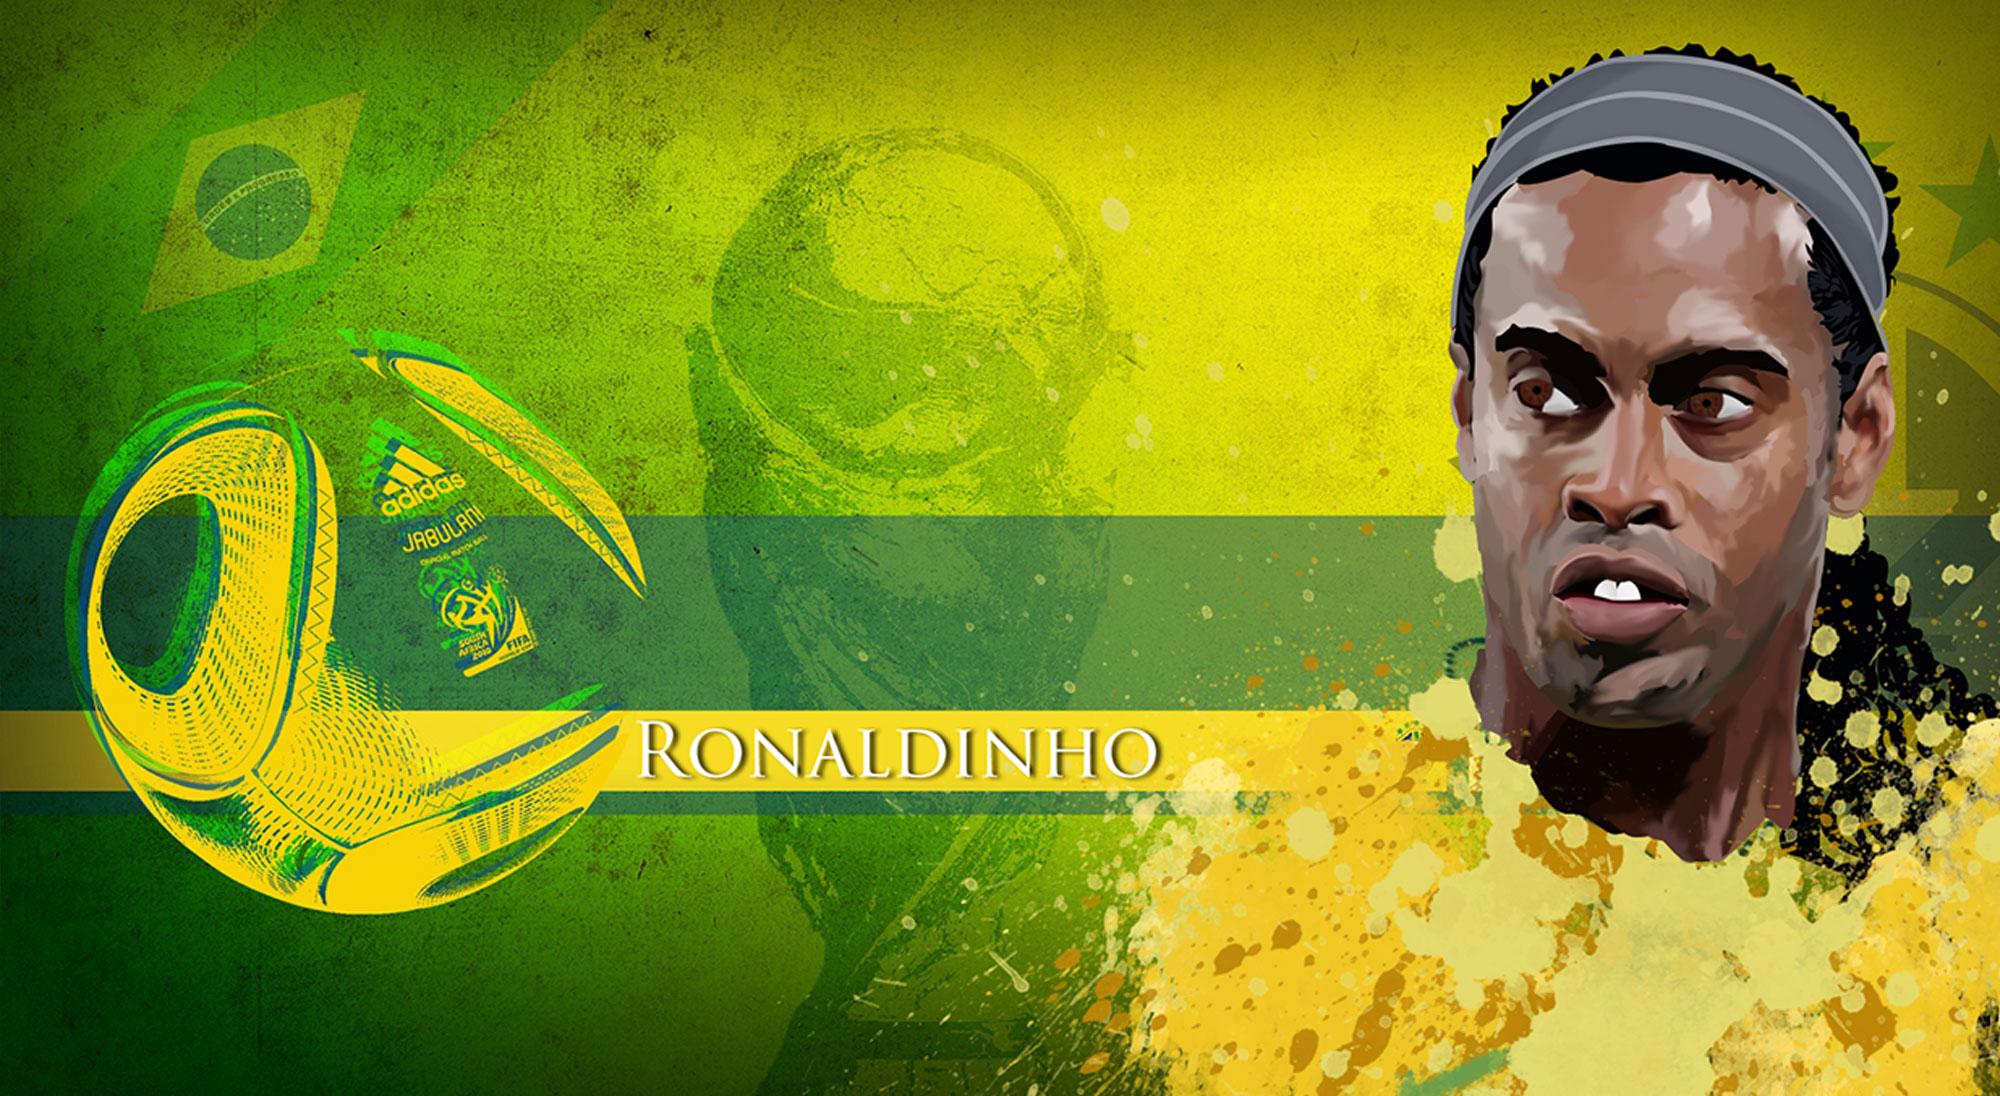 Ilustración de Ronaldinho con Brasil